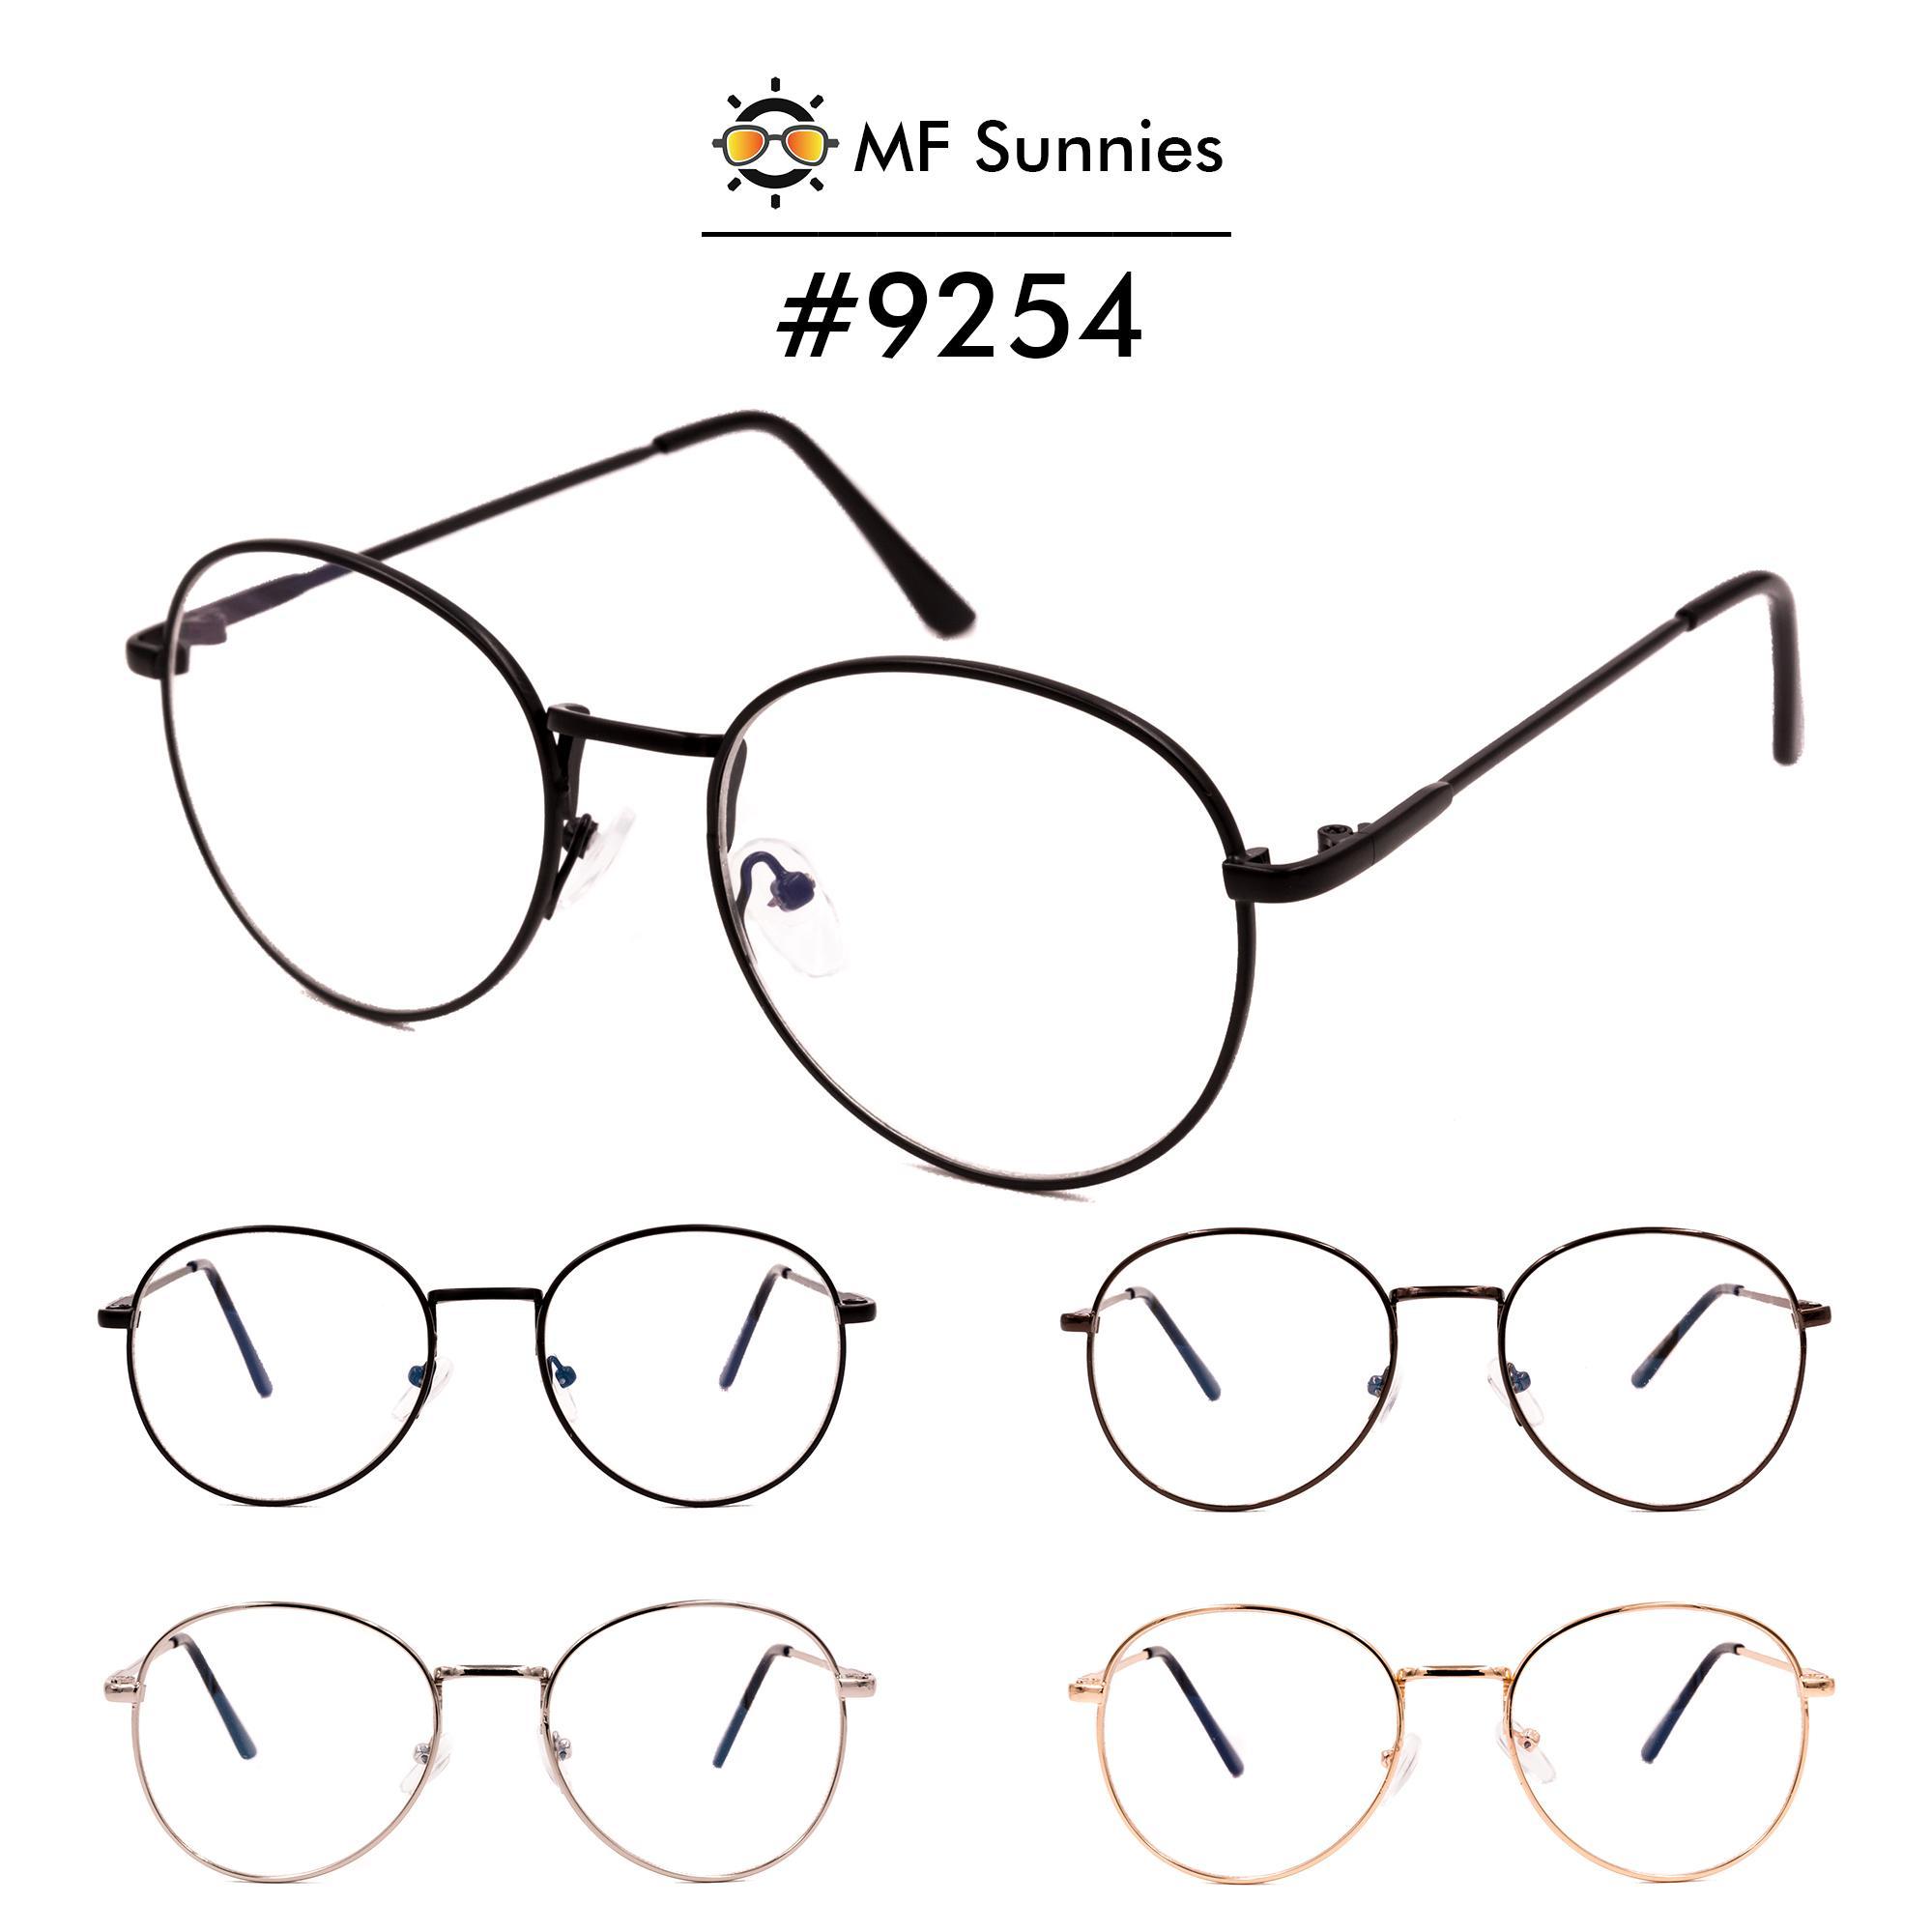 eyeglasses for sale reading glasses online brands prices  mfsunnies puter anti radiation blue light eyewear high quality metal optical frame metal hinges